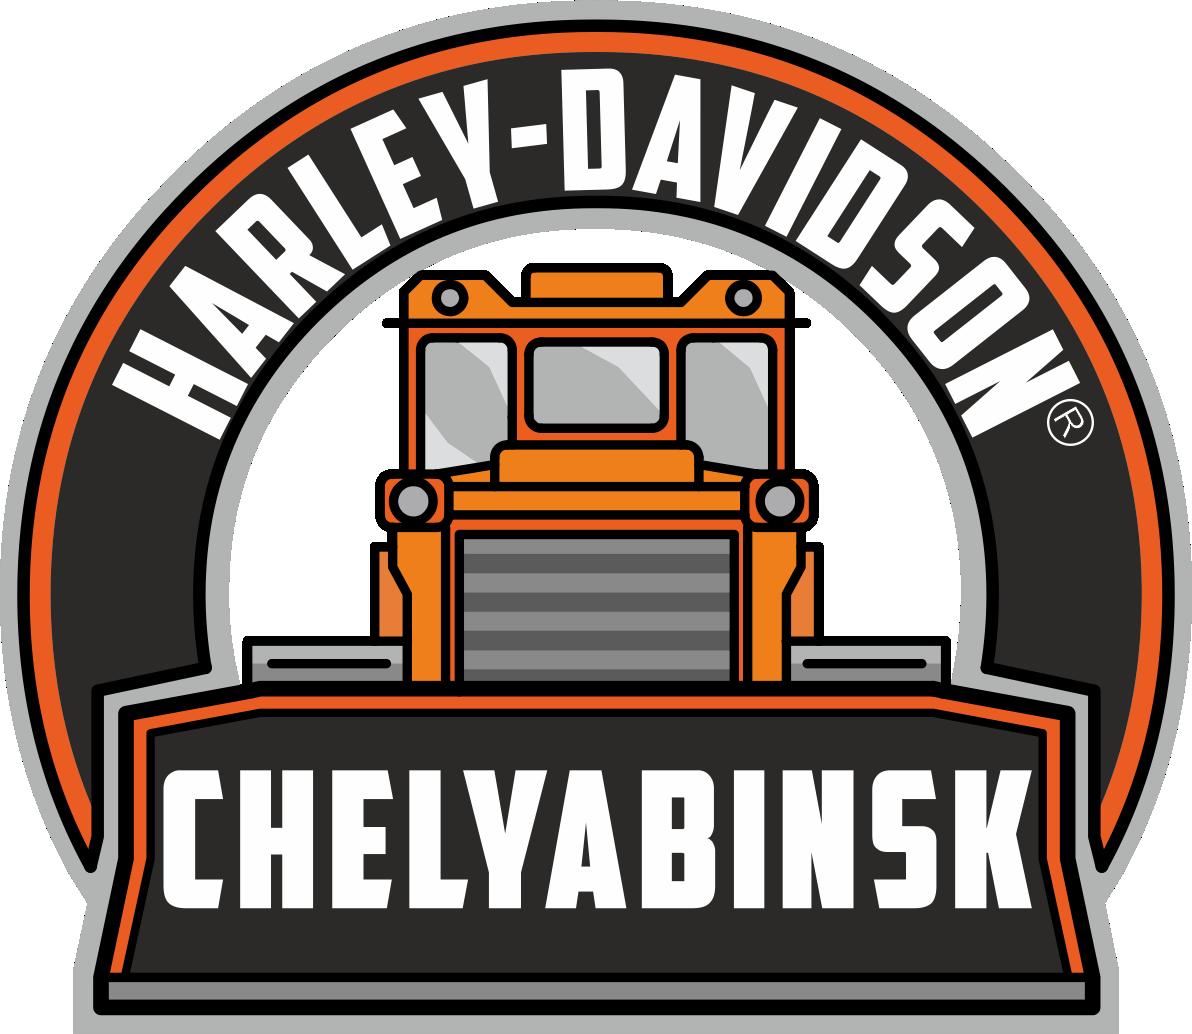 Harley-Davidson<sup>®</sup> Челябинск